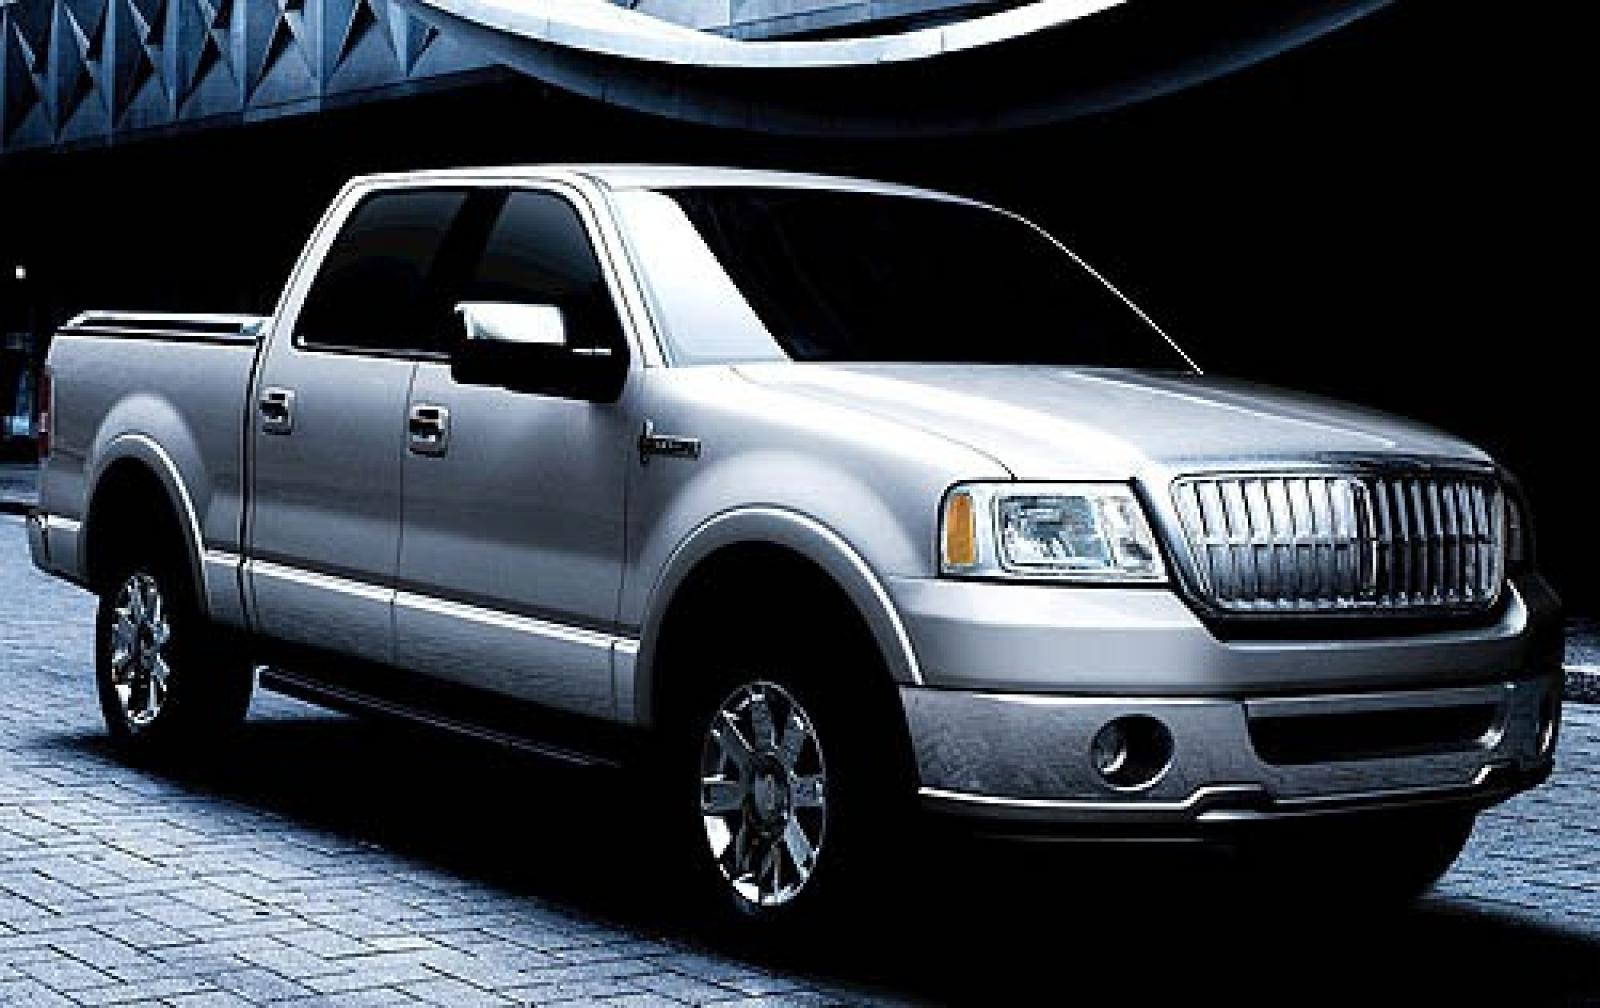 2007 Lincoln Mark Lt 1 800 1024 1280 1600 Origin